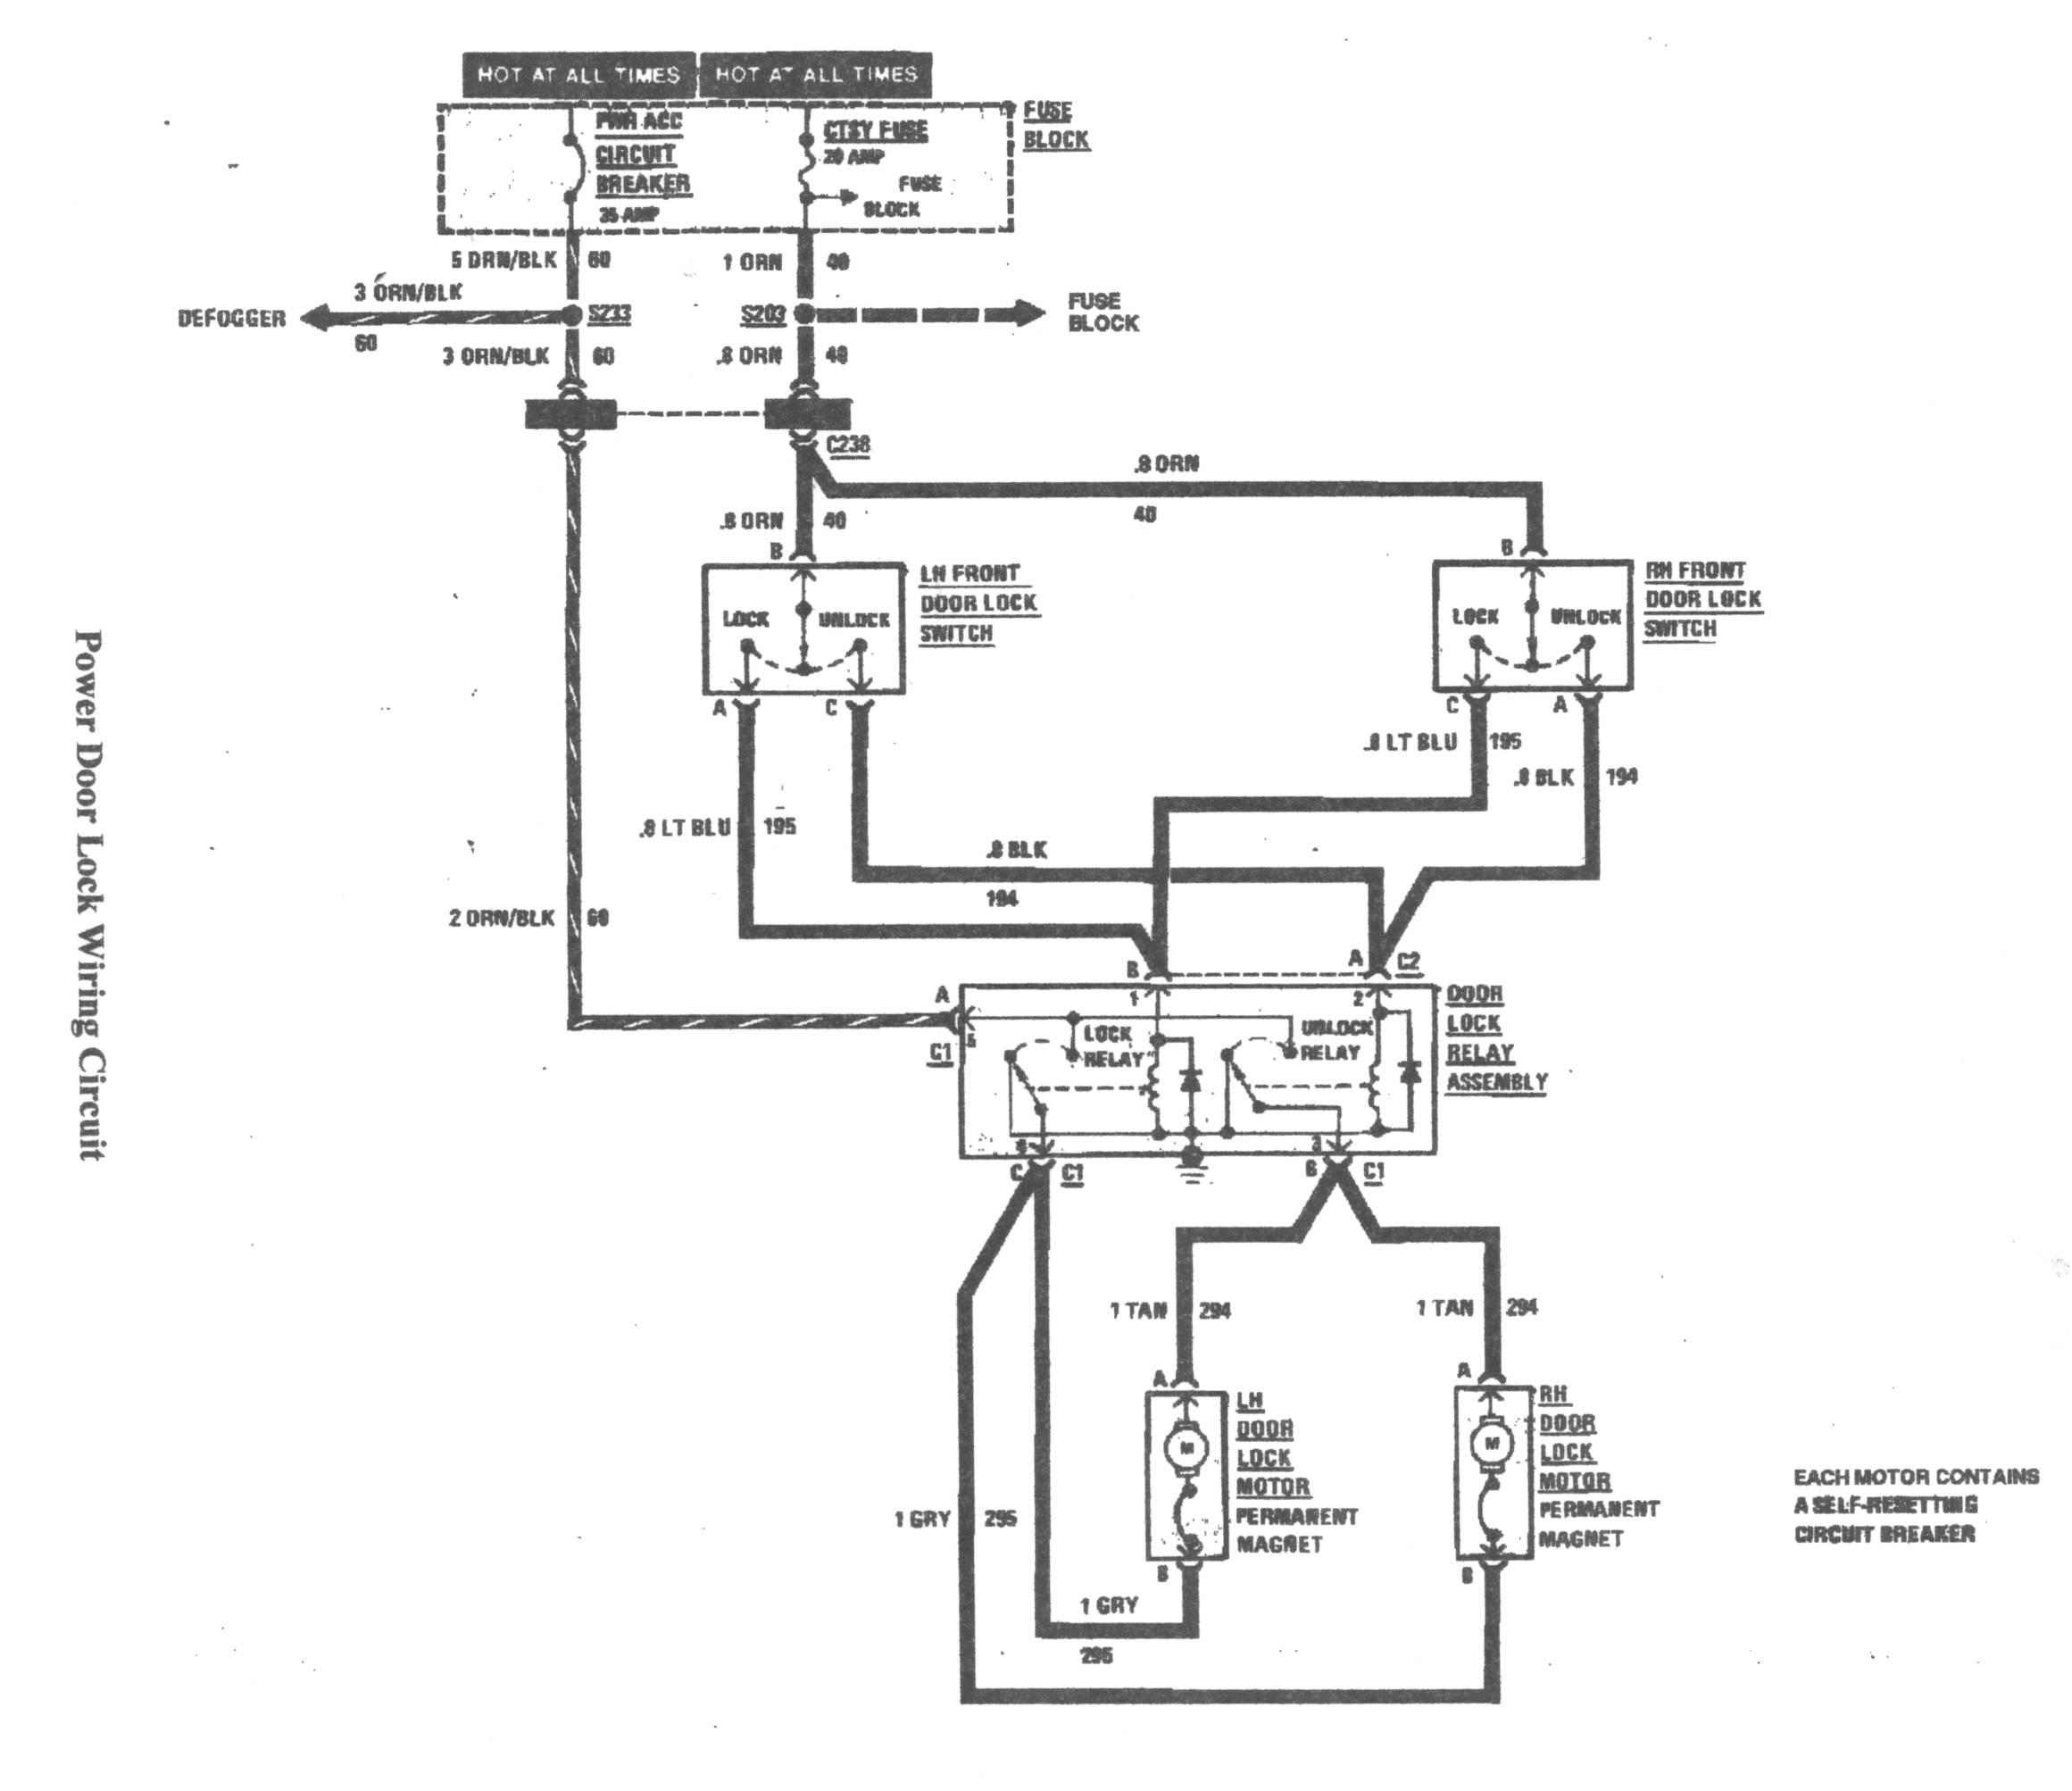 central locking actuator wiring diagram